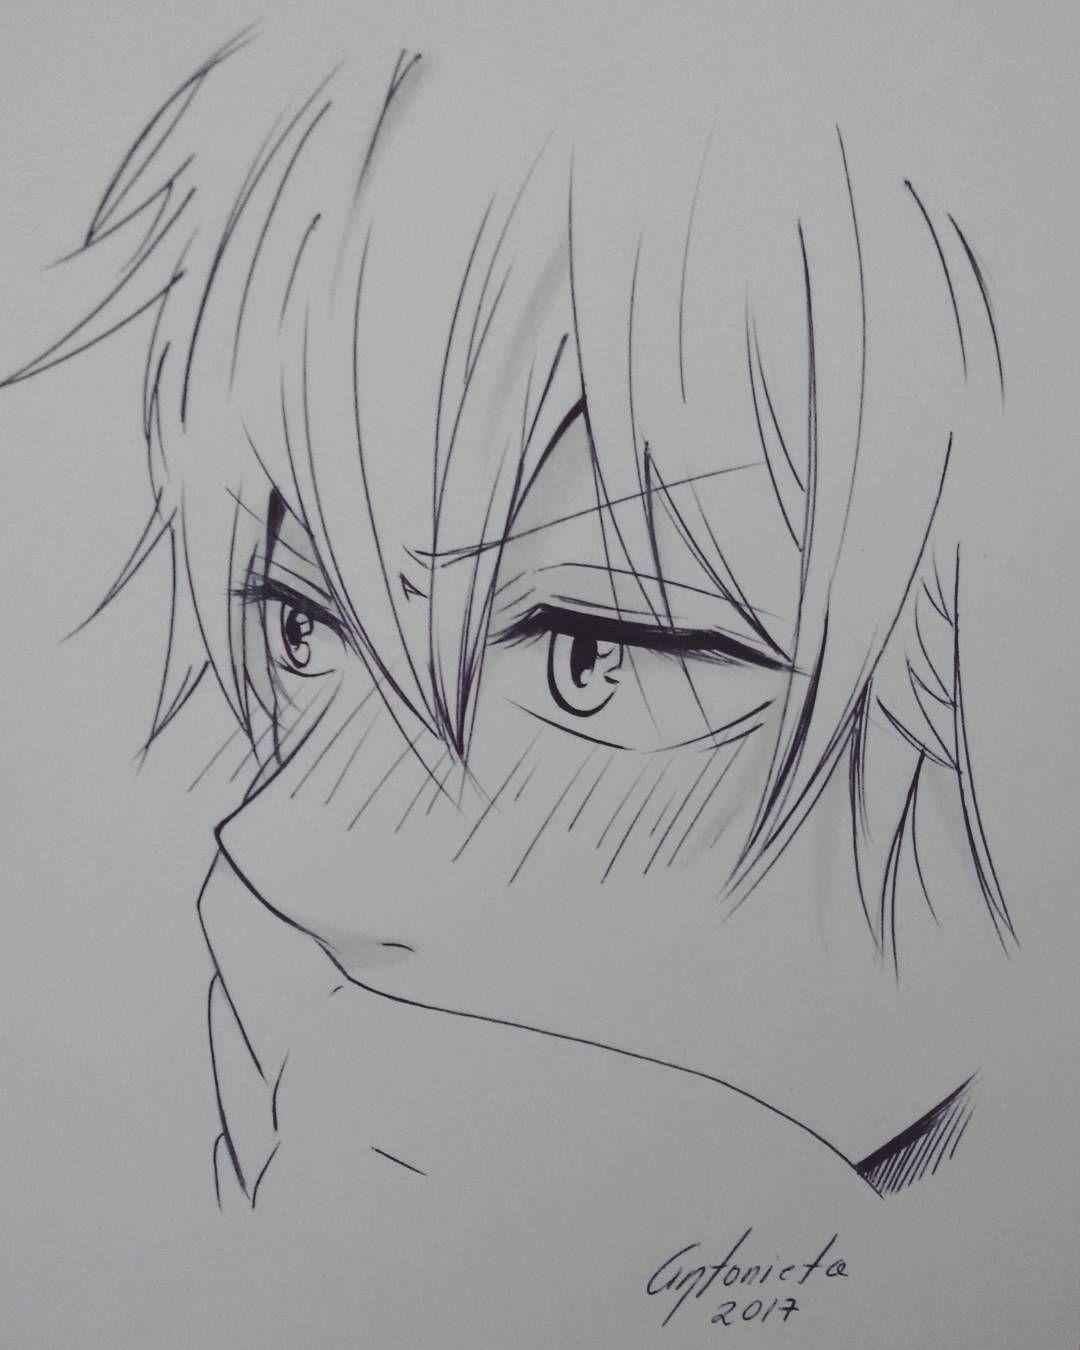 Аниме картинки парни нарисованные карандашом